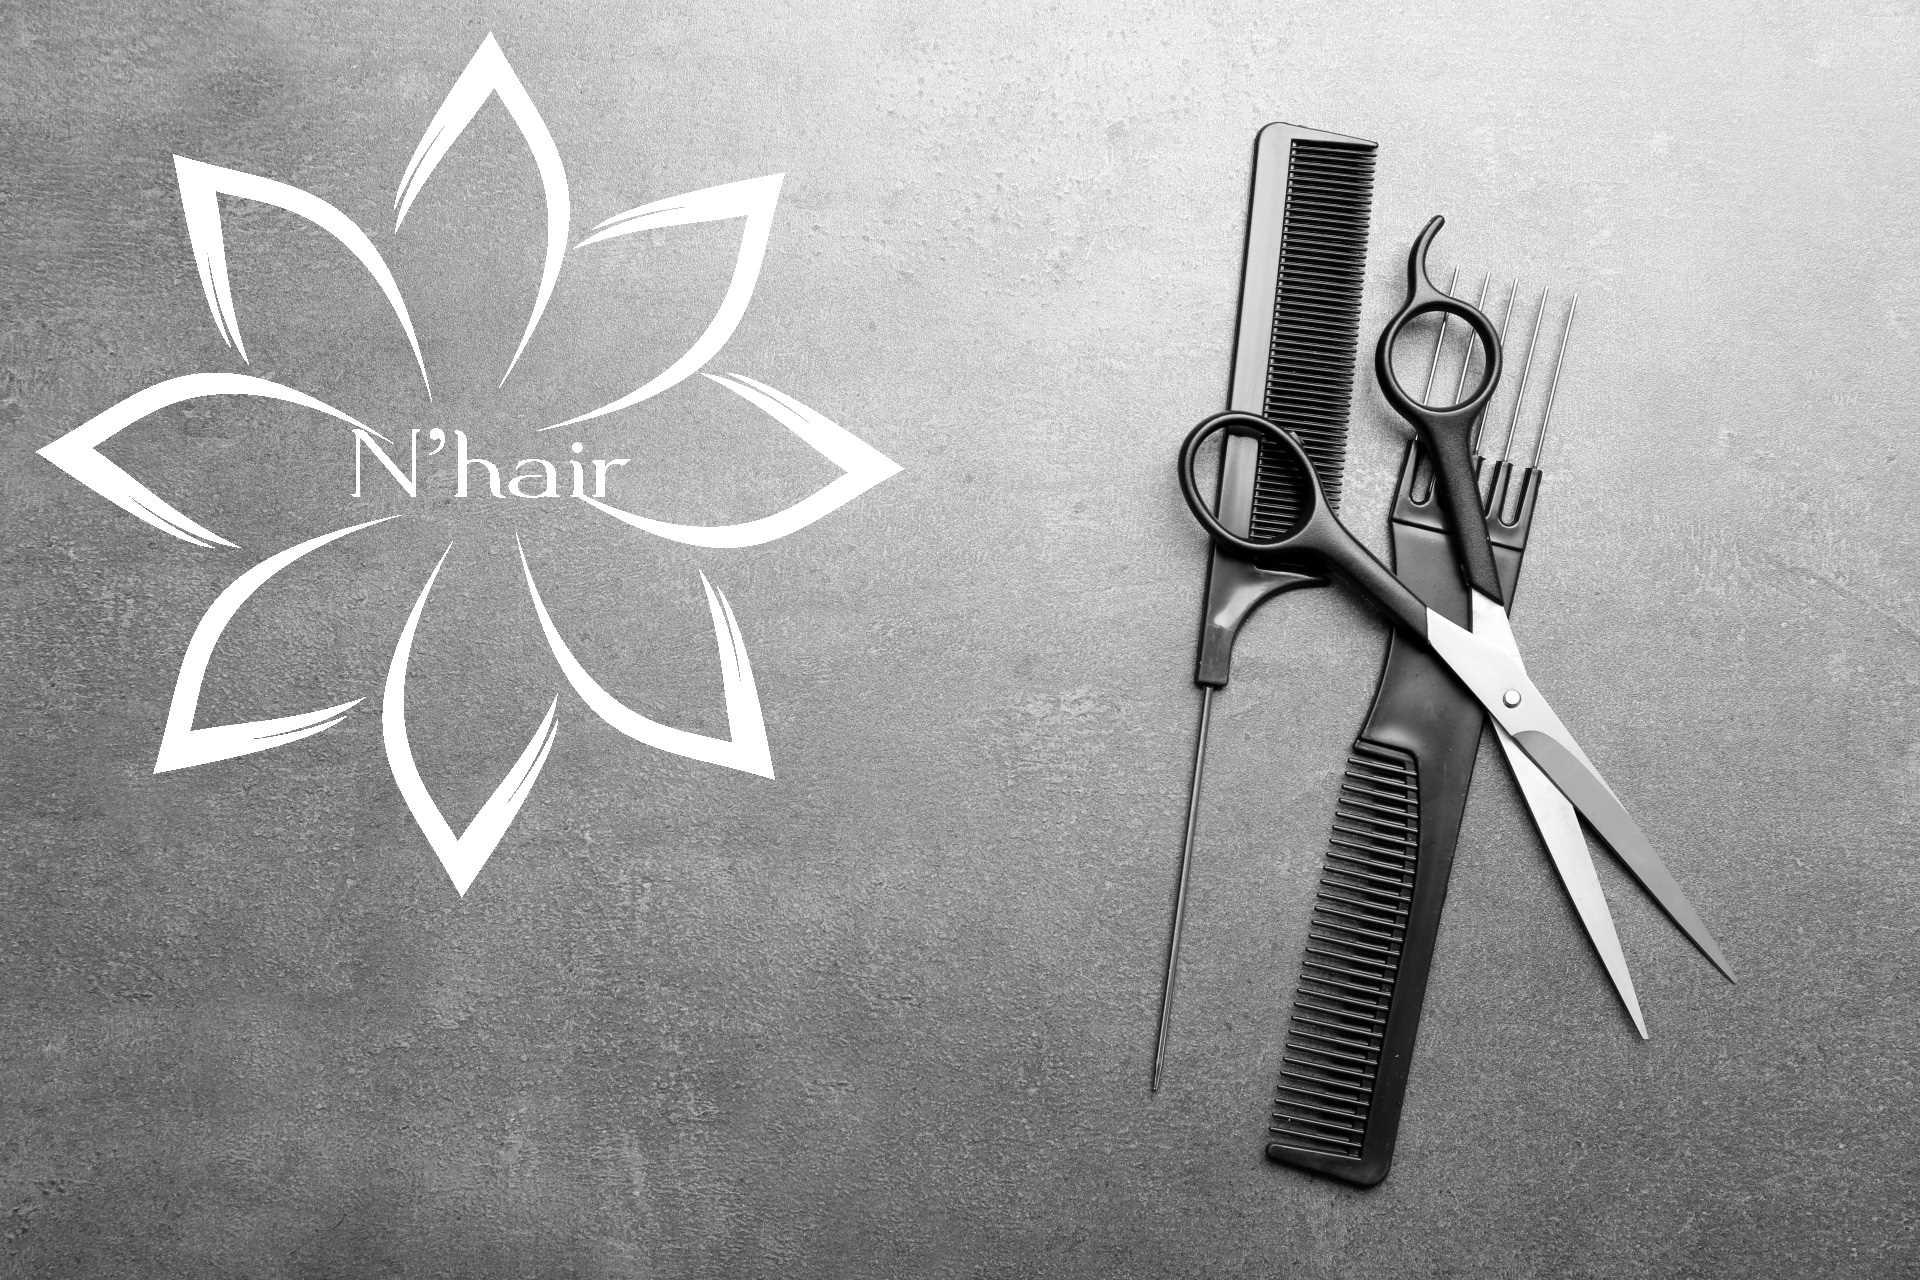 N'Hair